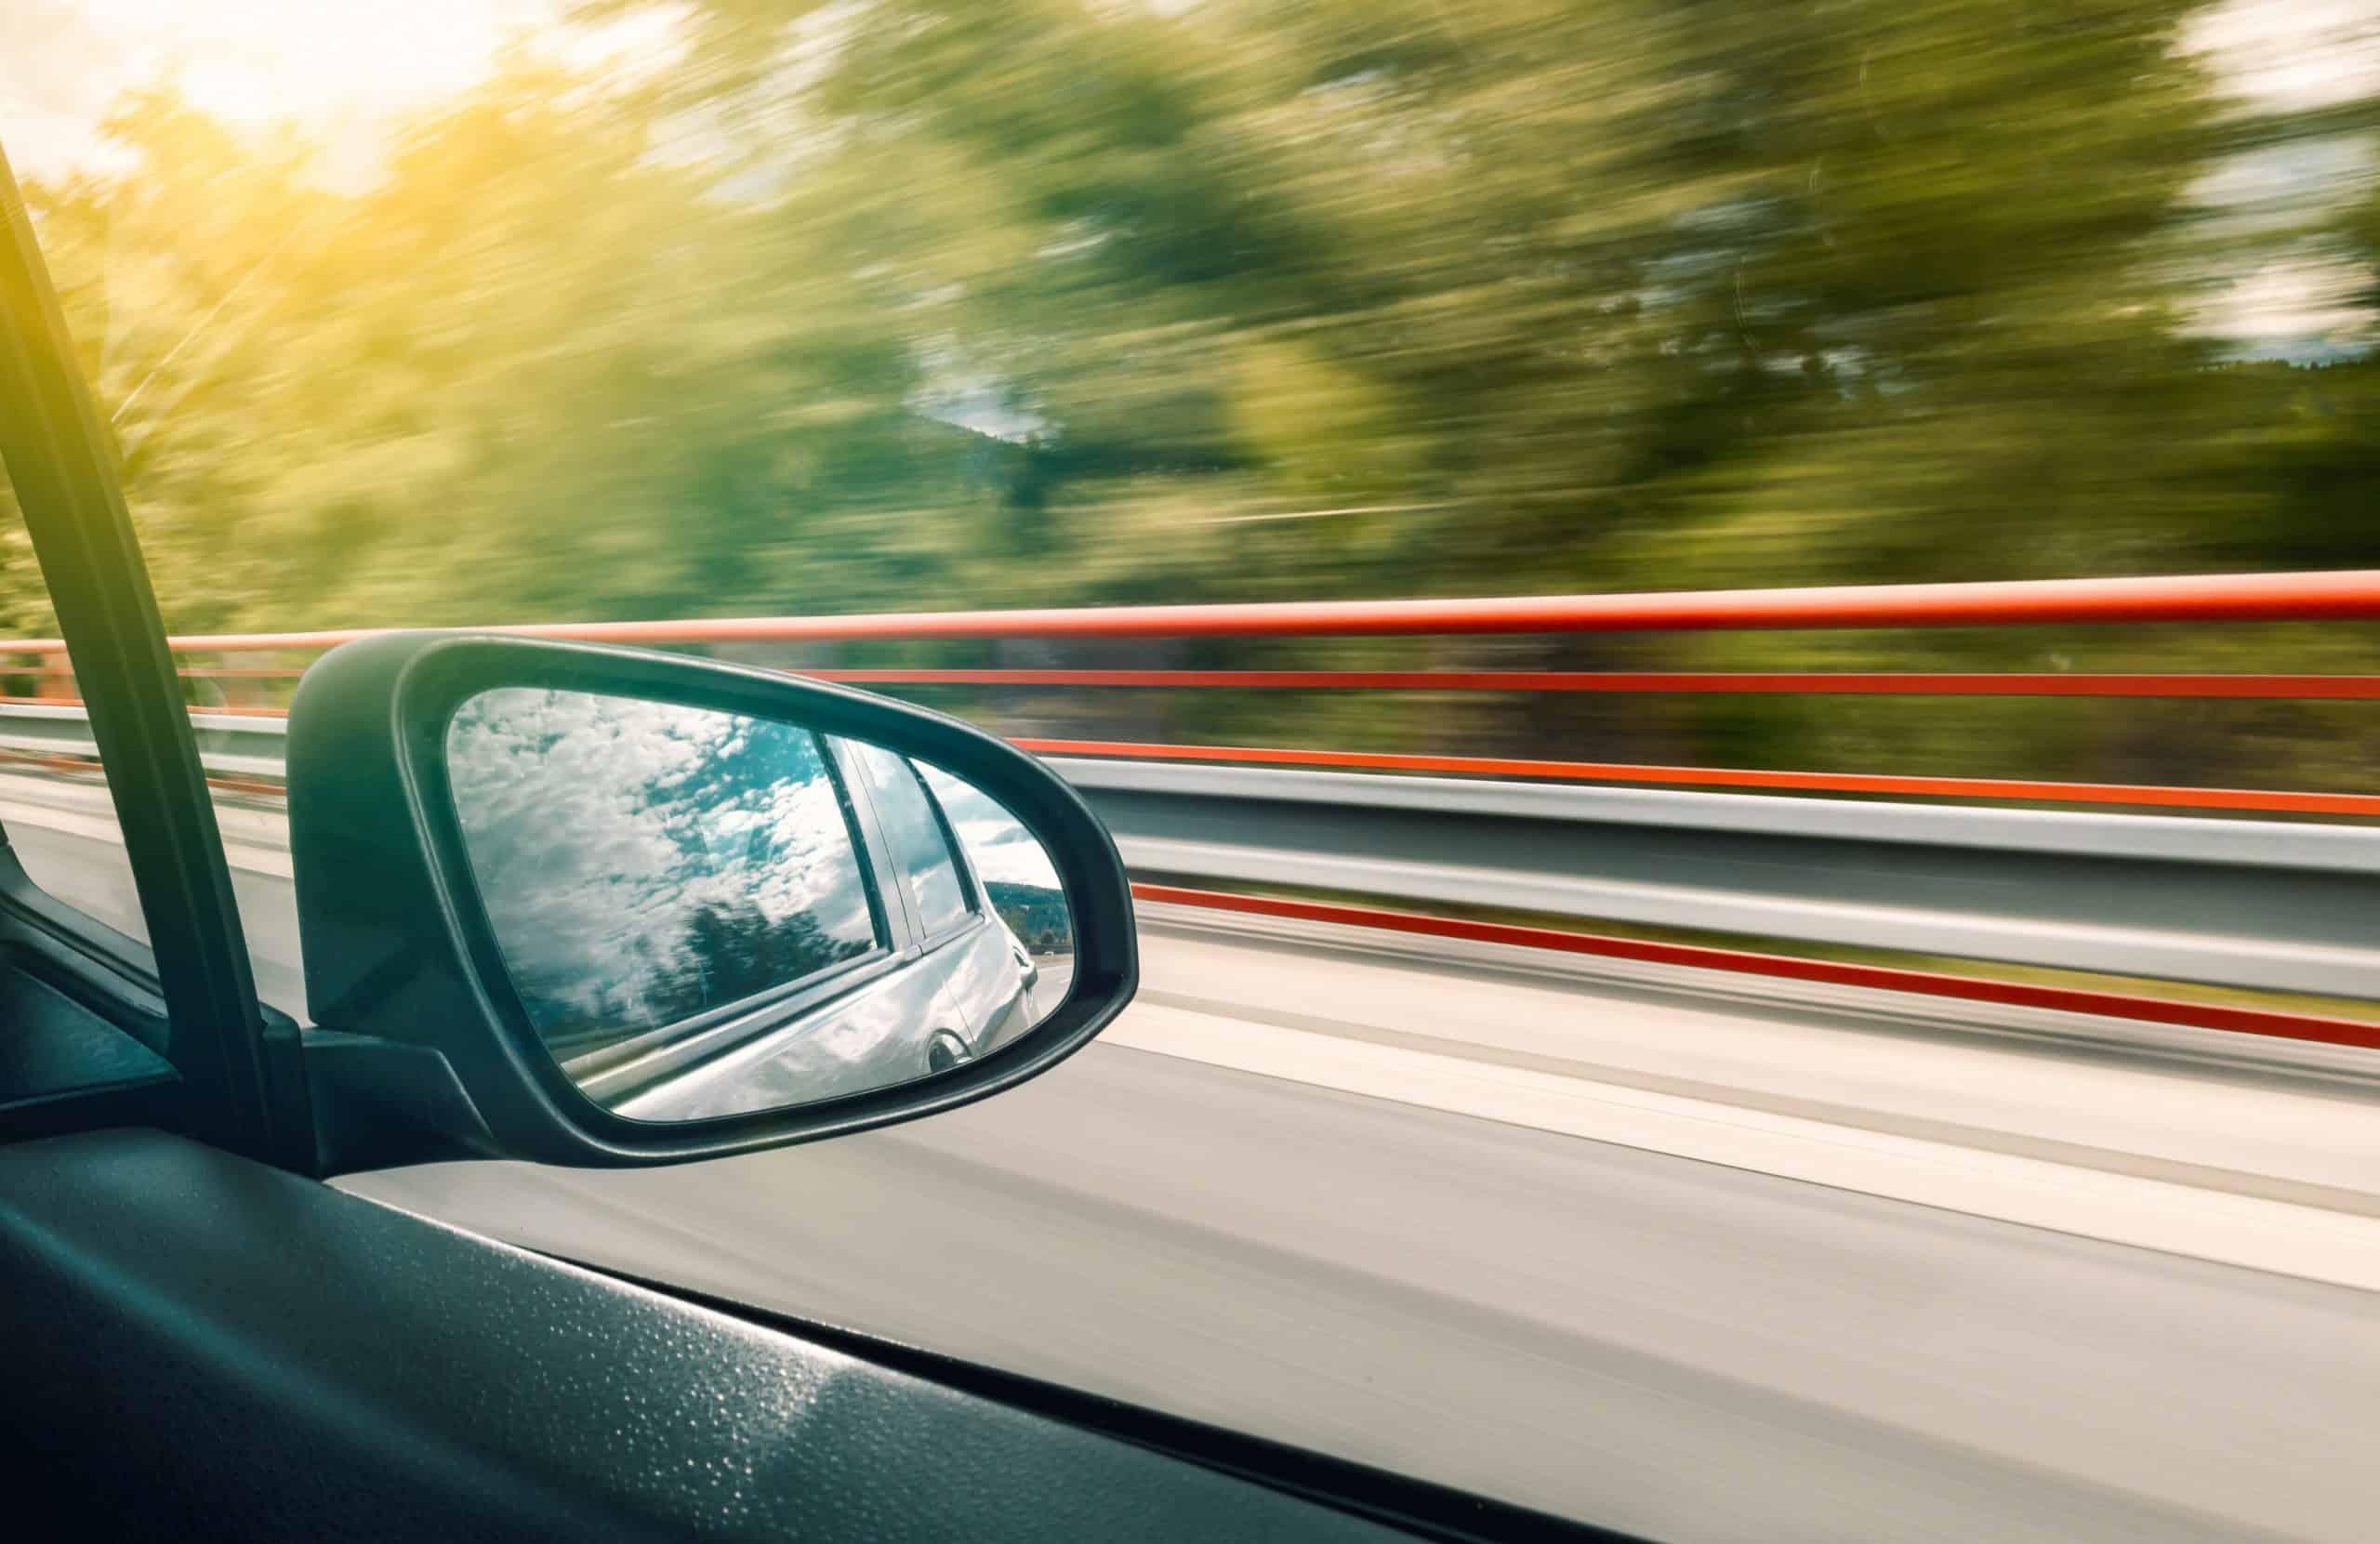 1 Killed in Interstate 15 Crash [Nipton, CA]